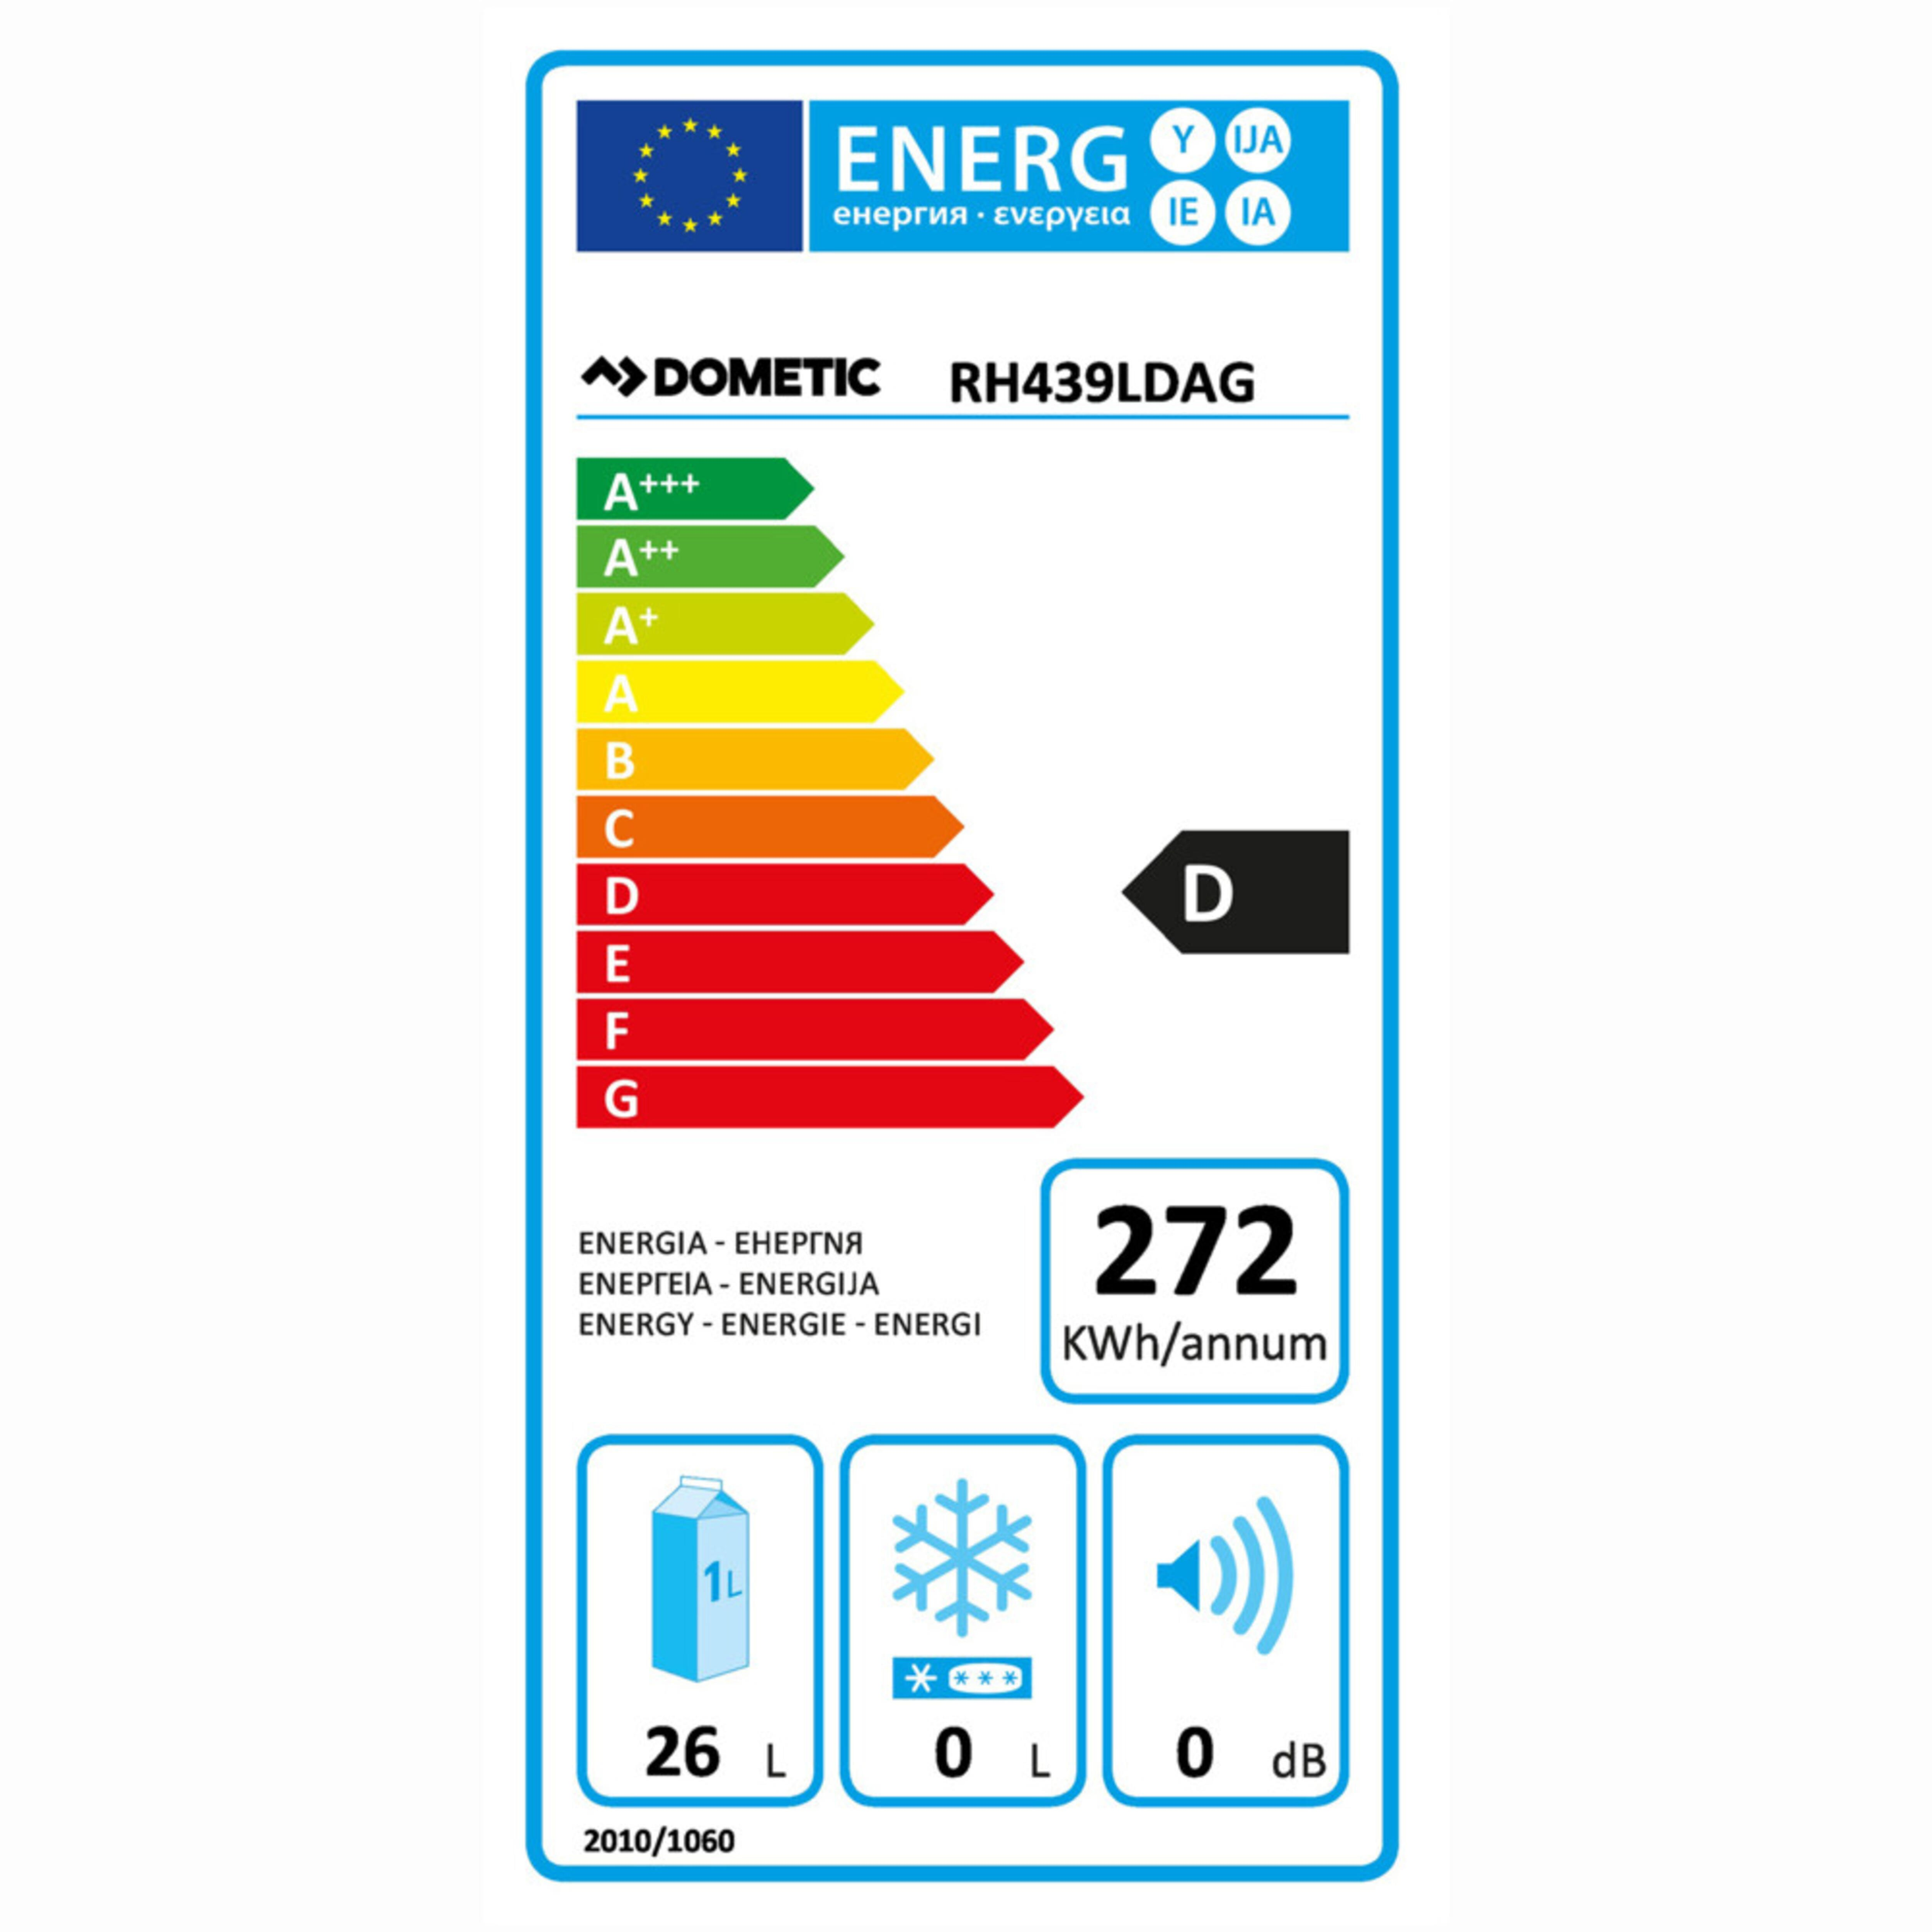 Dometic RH 439 LDAG Energy label